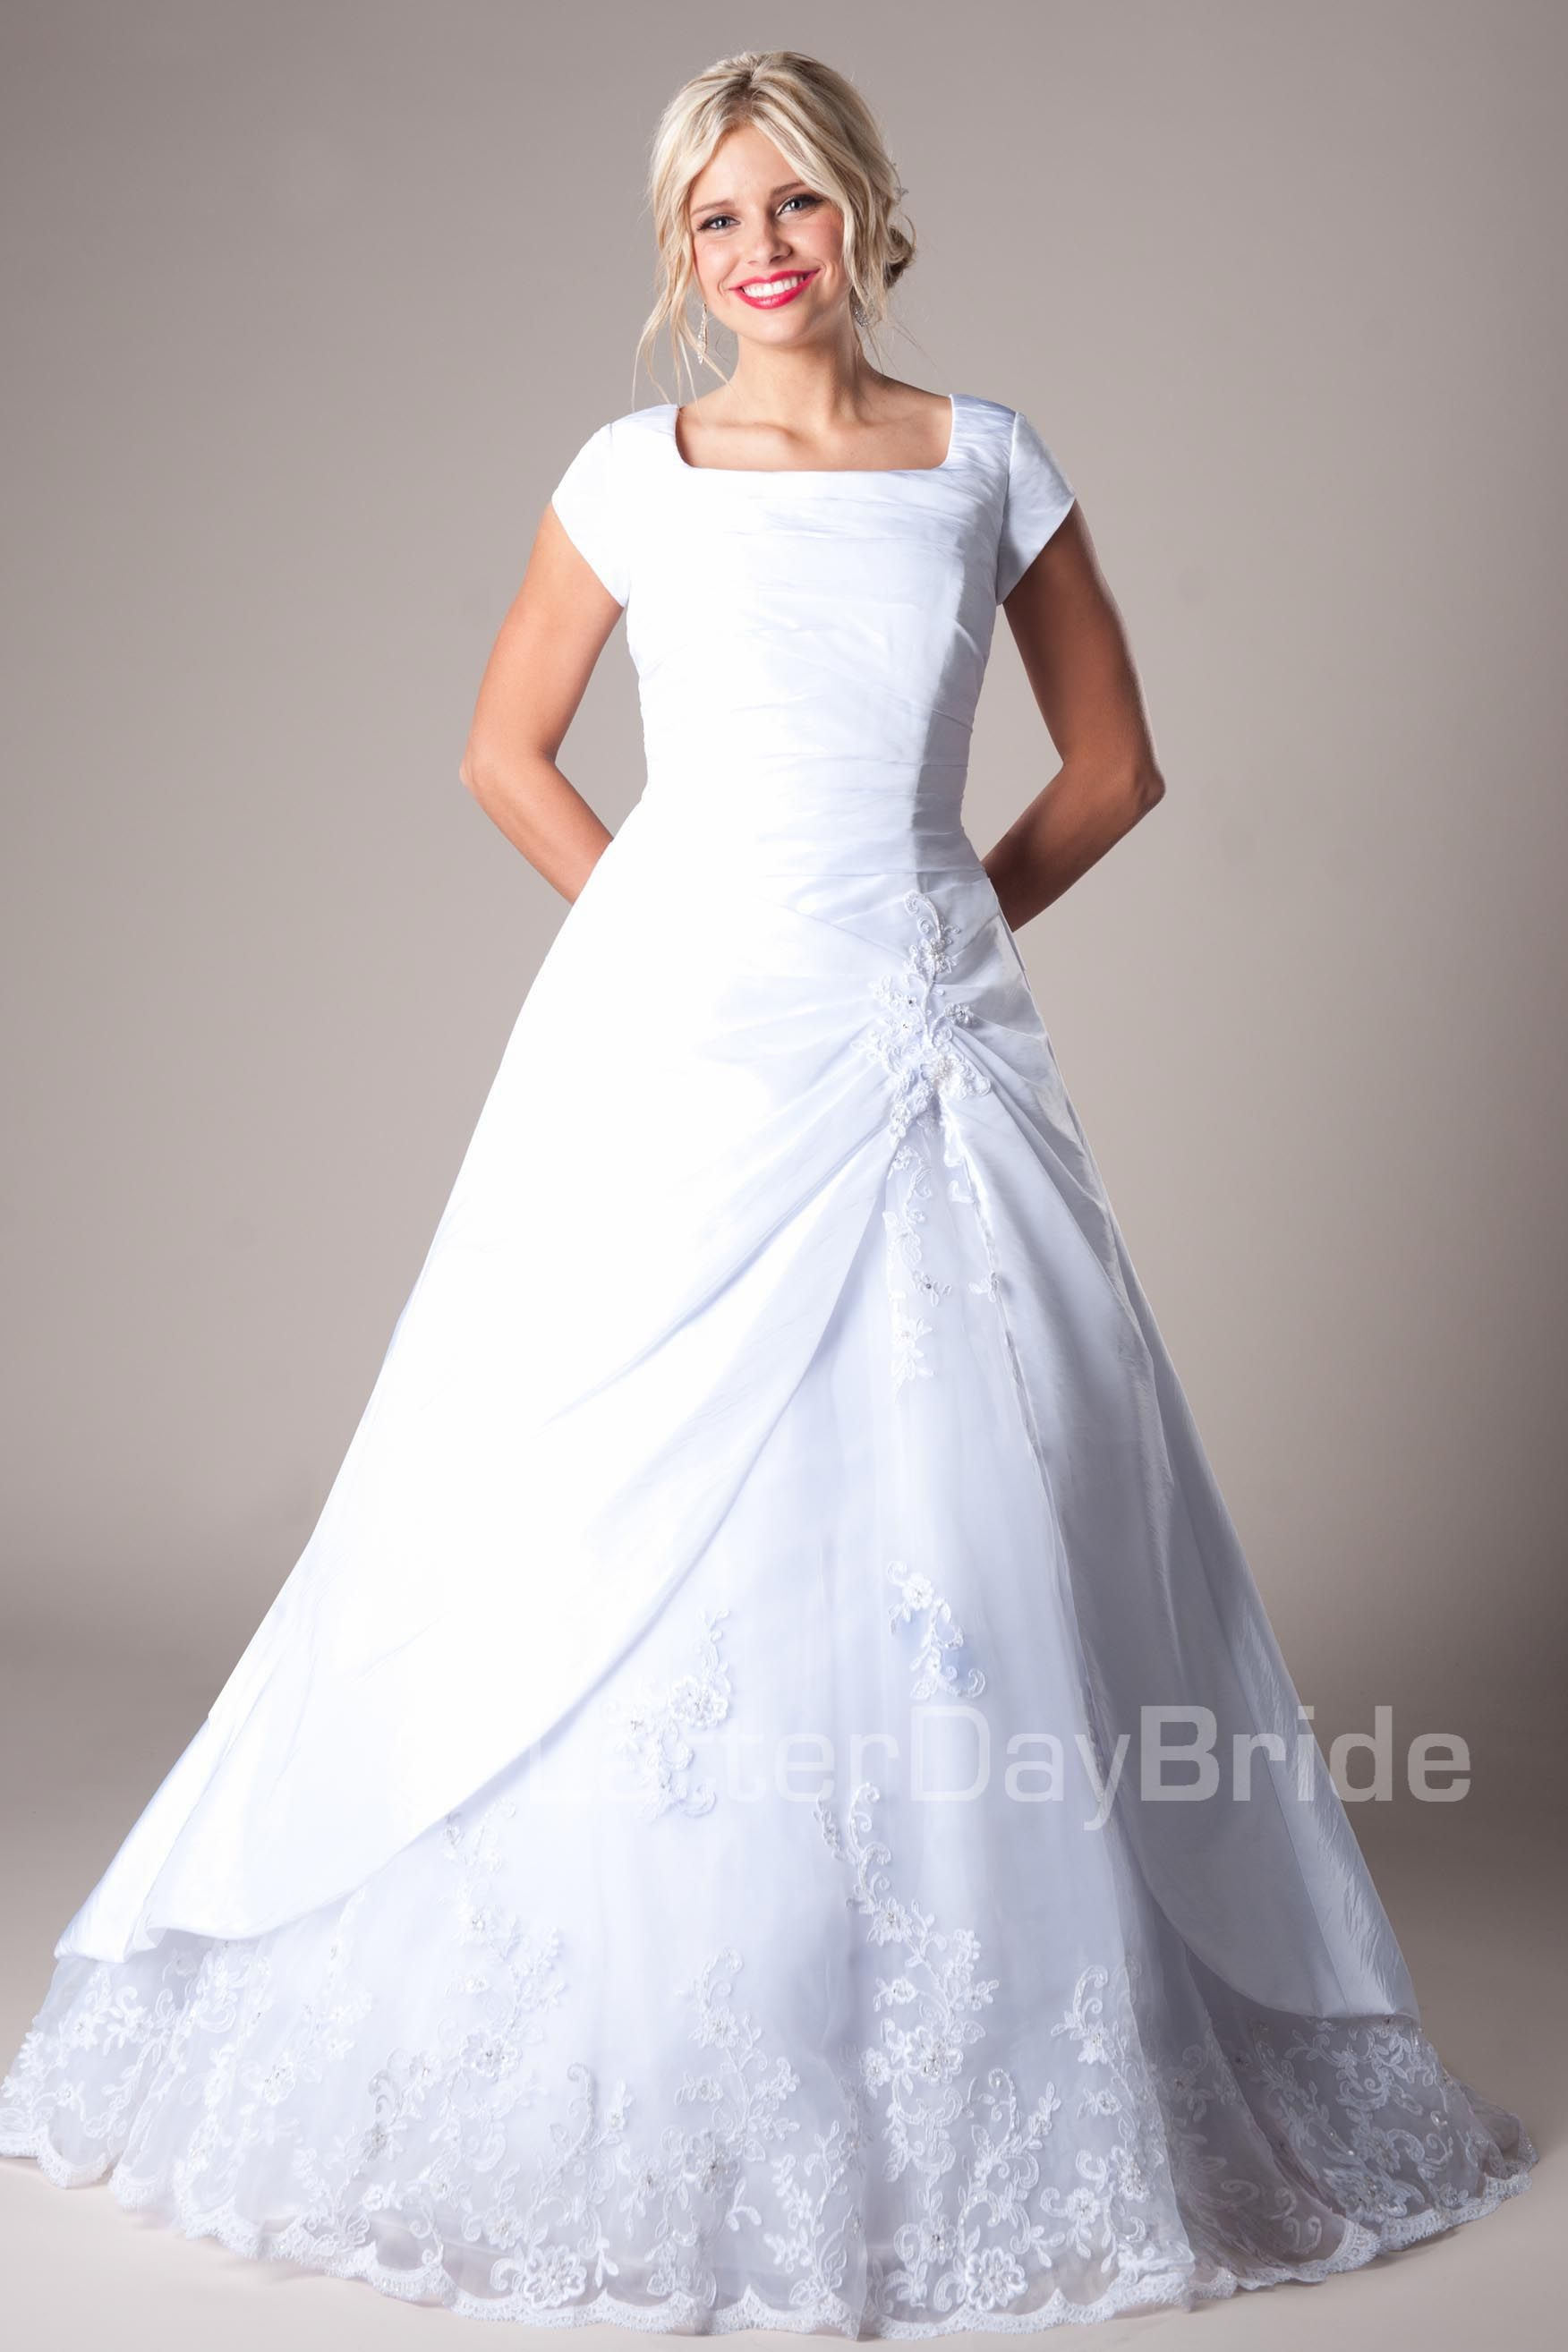 Kaori Modest Wedding Dress Latter Day Bride & Prom Gateway Bridal ...